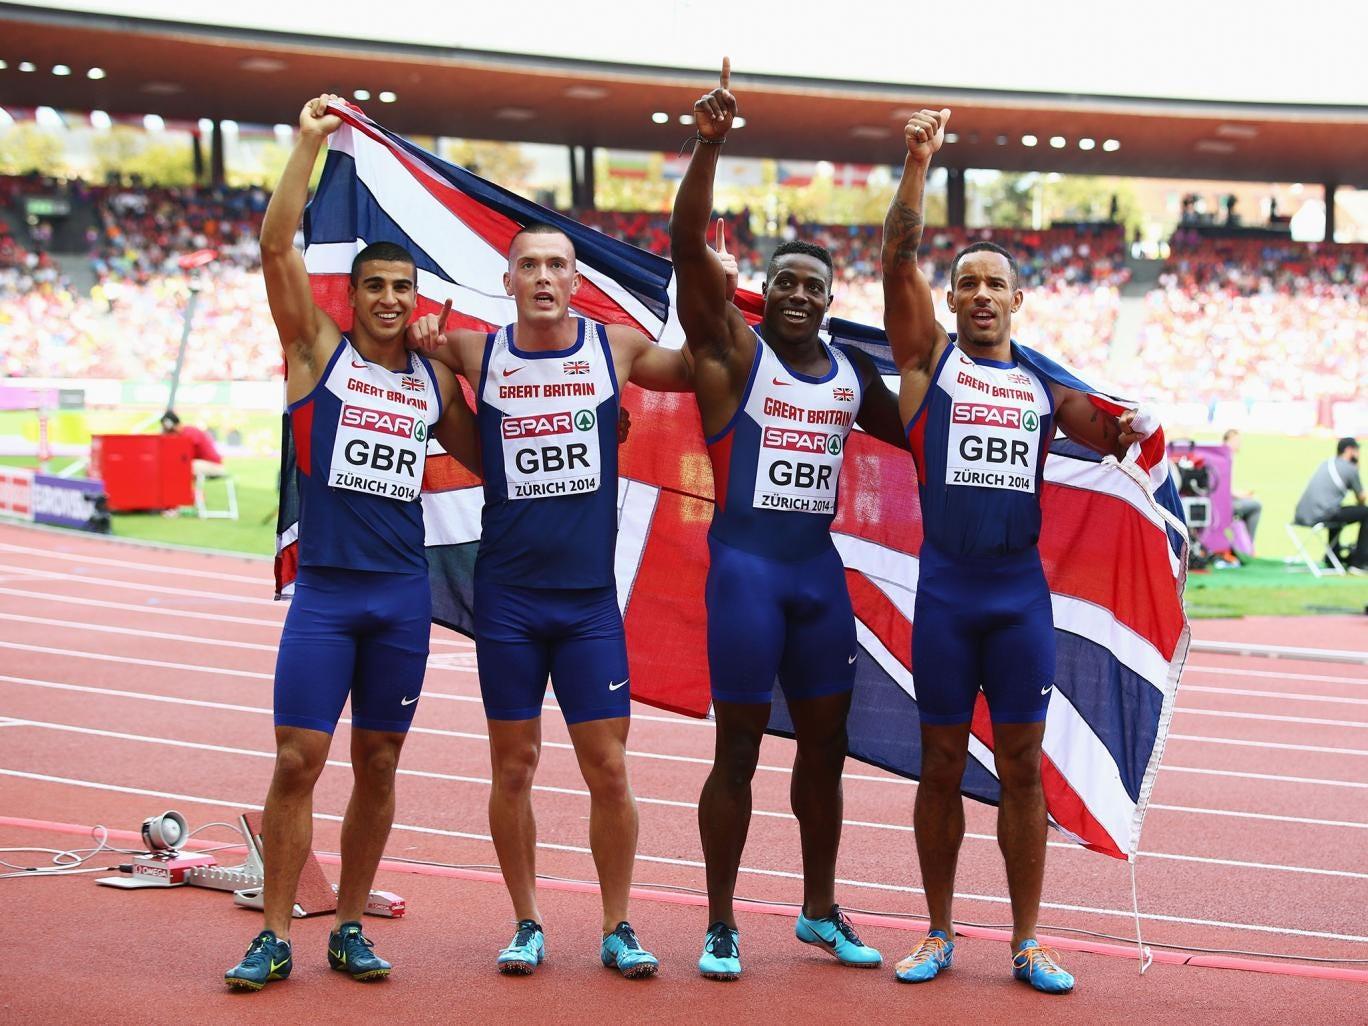 Britain's 4x100m  European gold medallists (left to right) Adam Gemili, Richard Kilty, Harry Aikines-Aryeetey and James Ellington celebrate in Zurich on Sunday